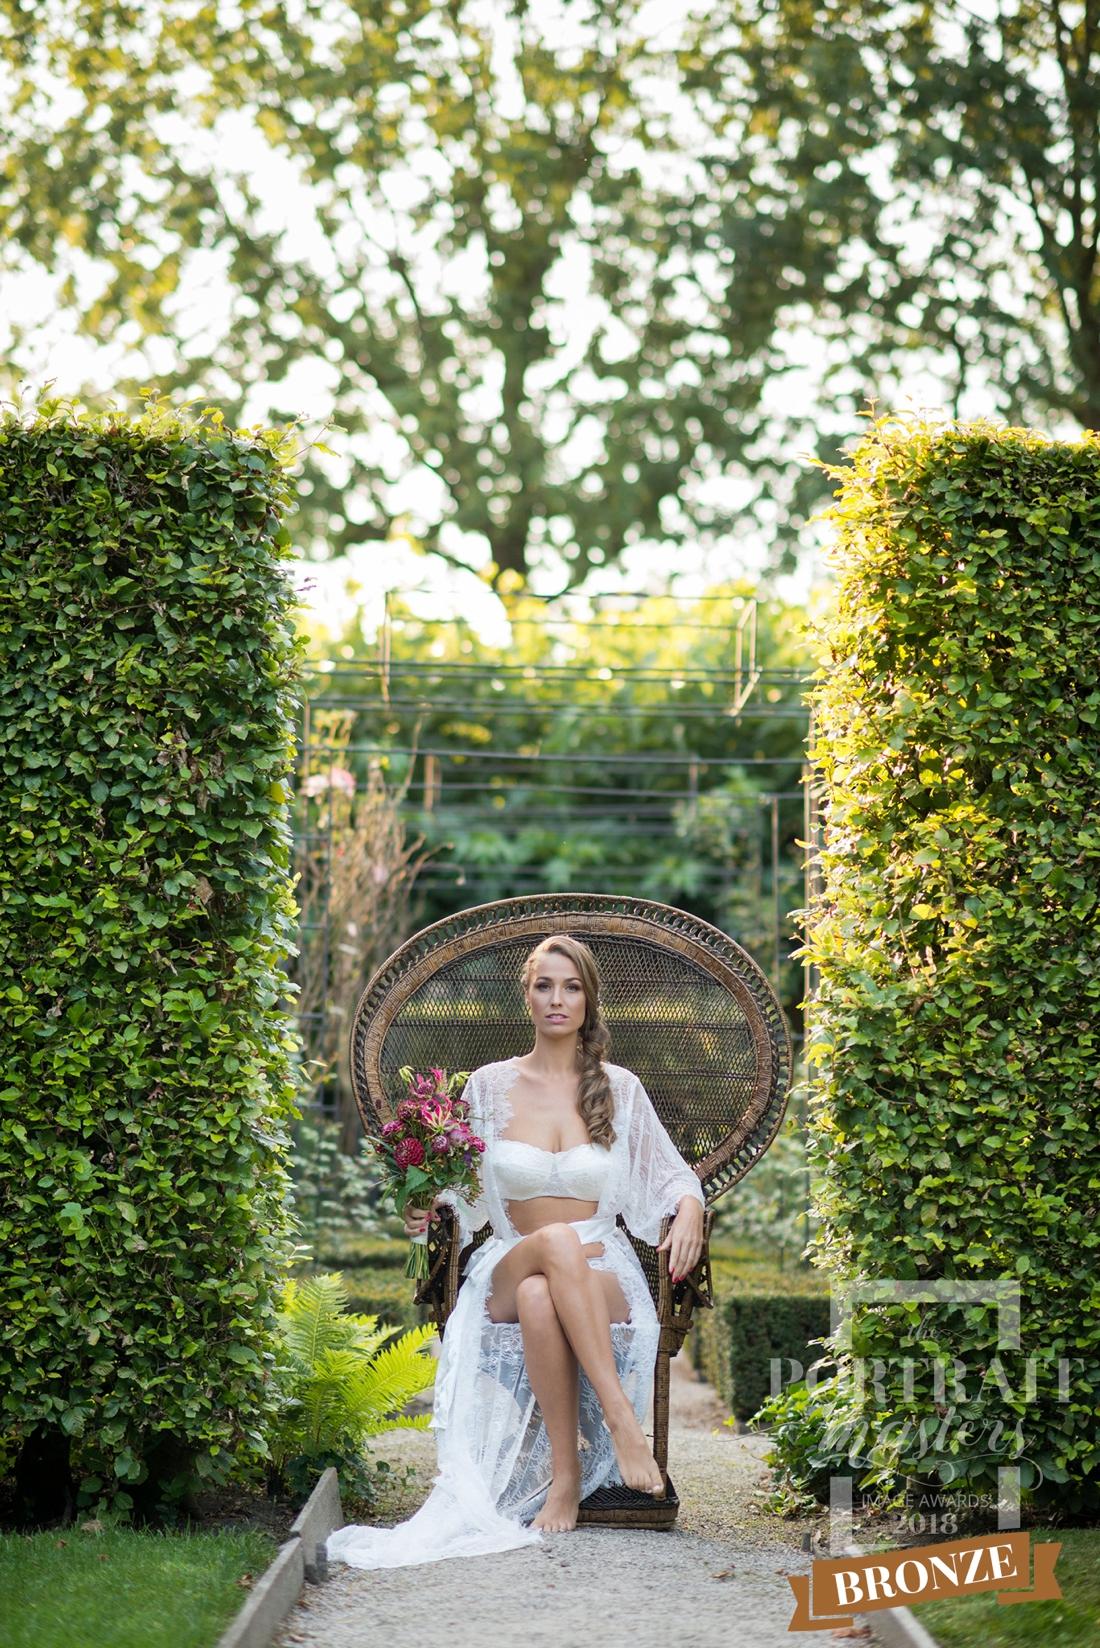 portret-fotografie-award-outdoor-boudoir-fotoshoot-buiten-breda